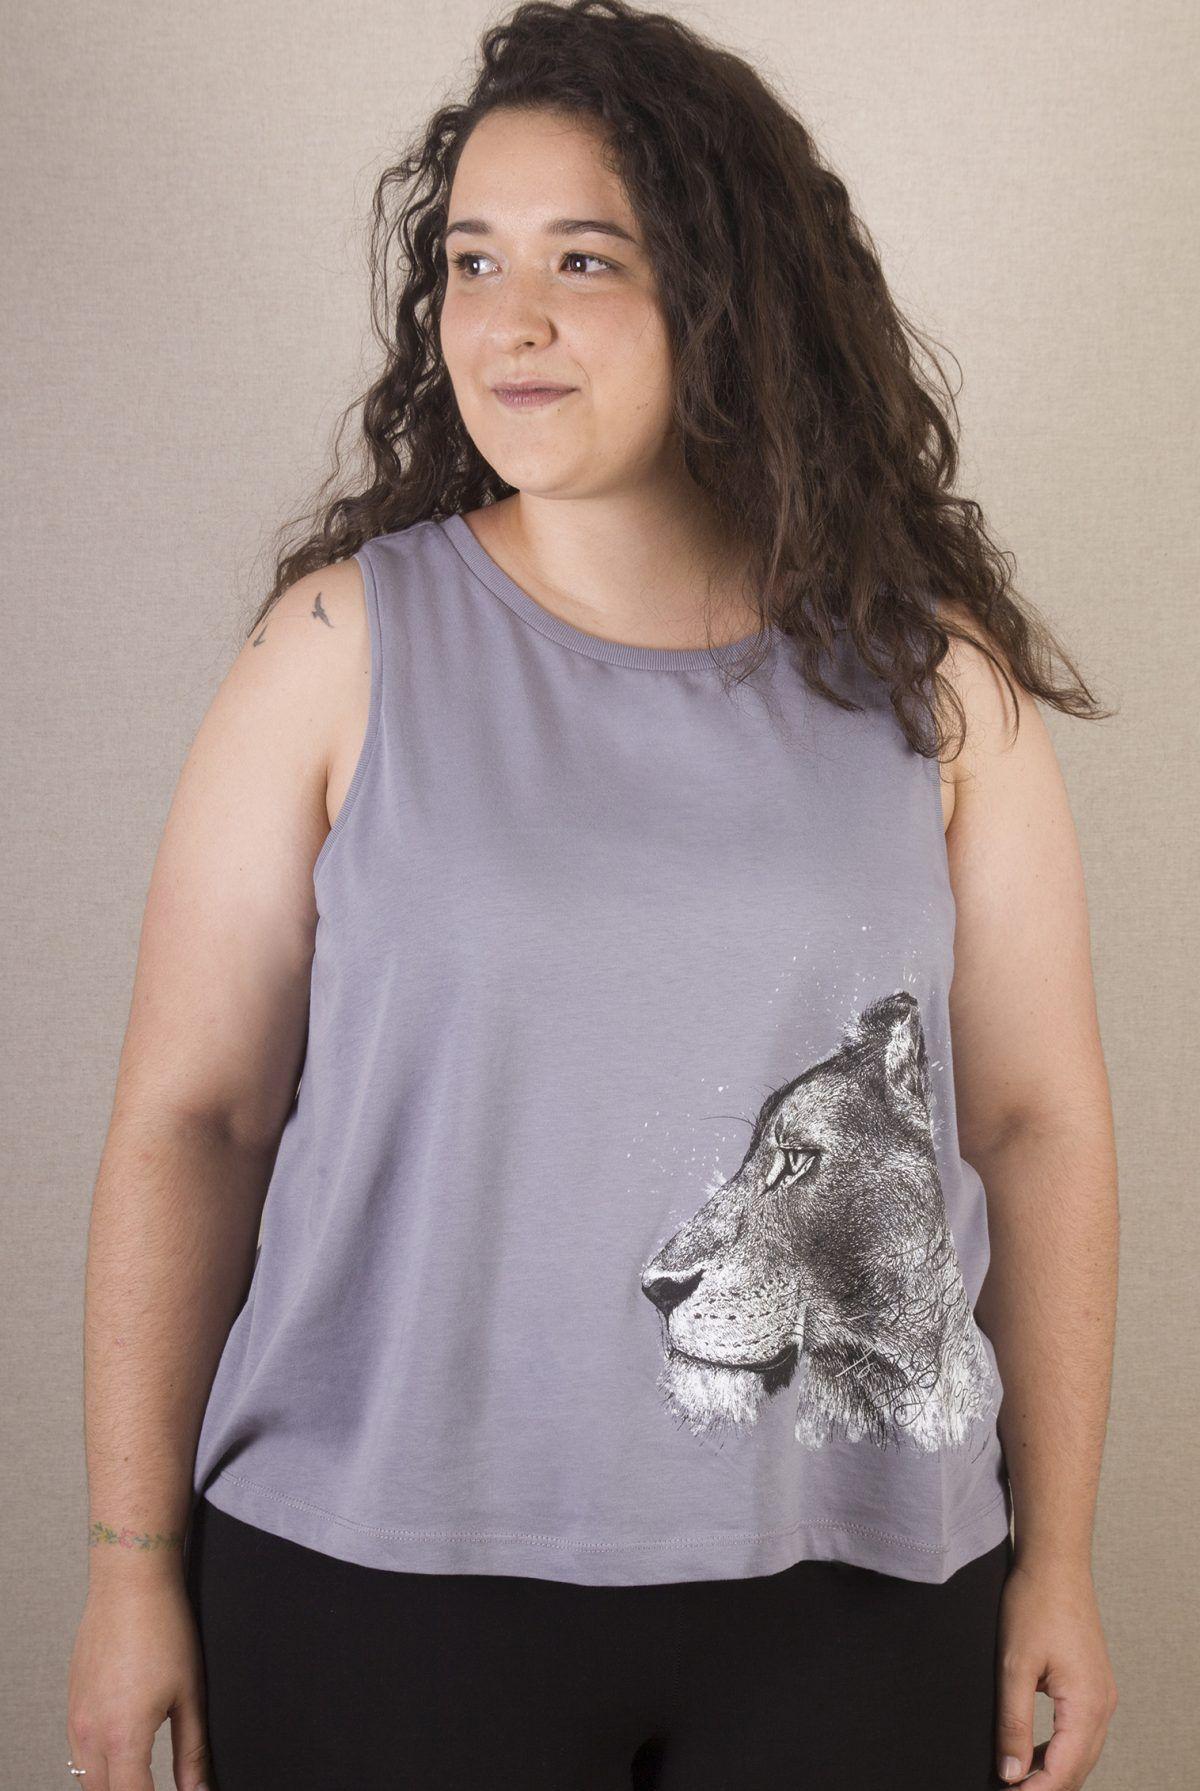 Camiseta mujer Leona de tirantes-sirem wild